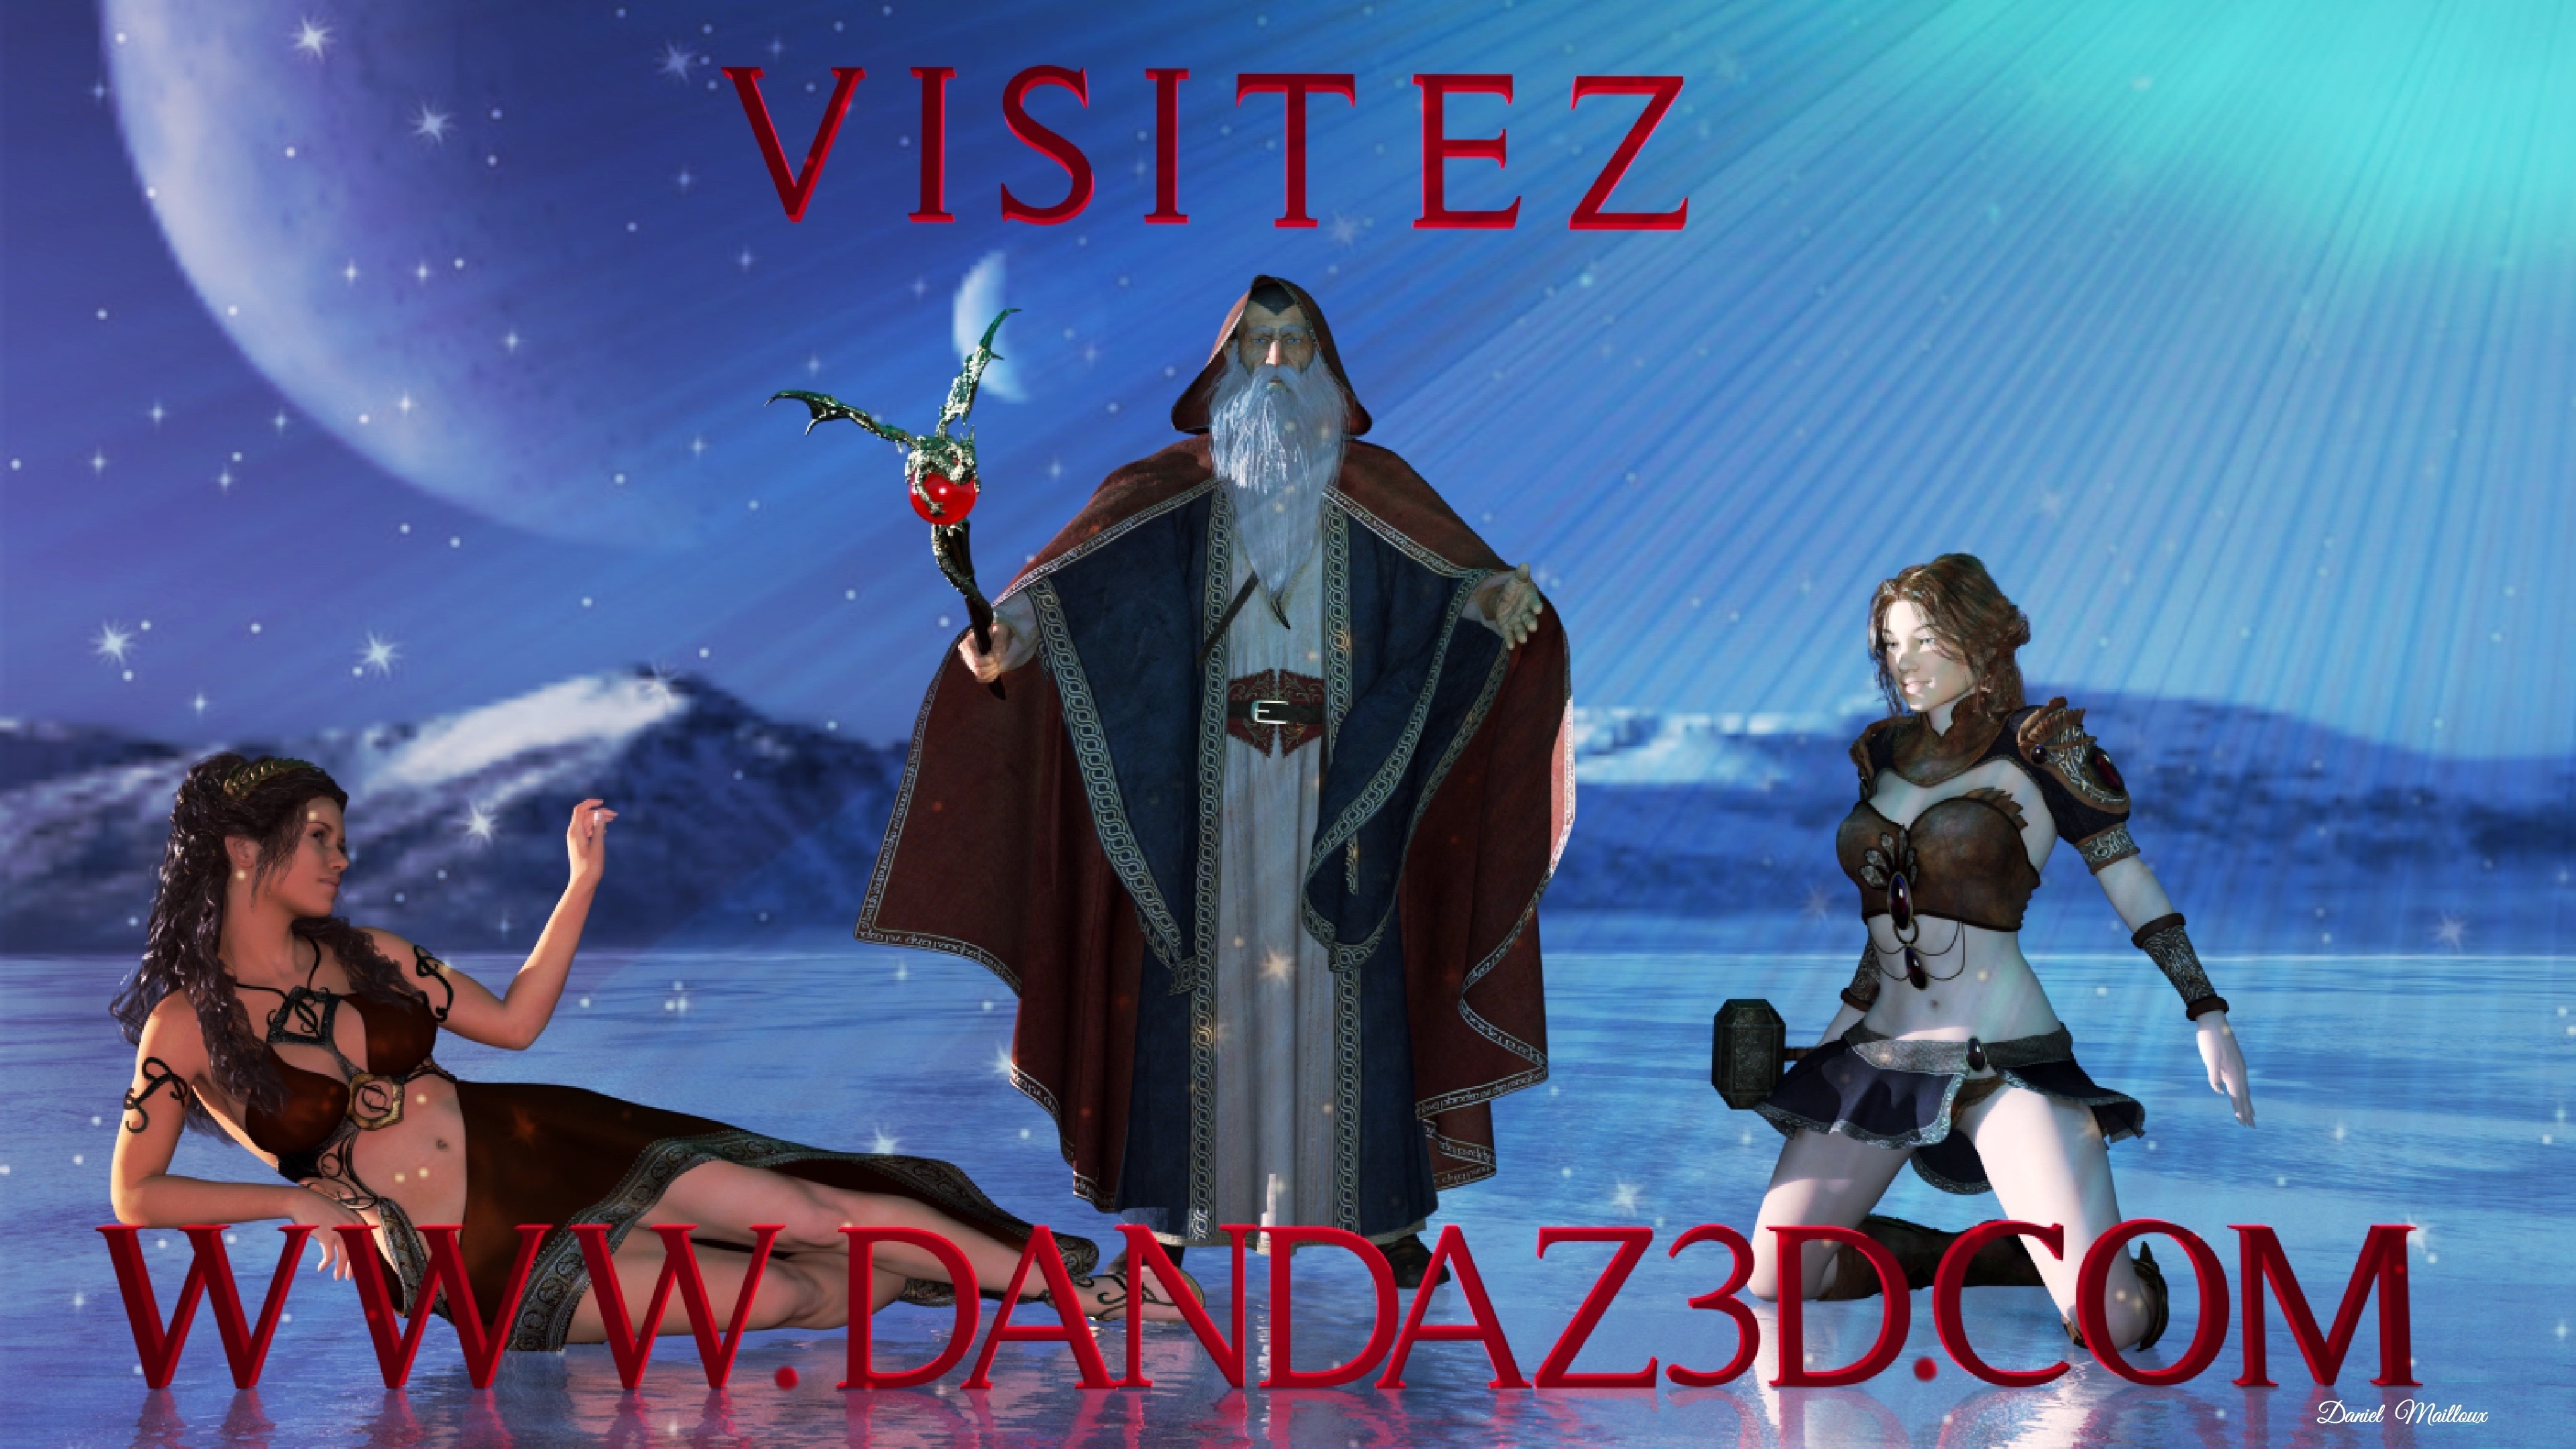 www.dandaz3d.com